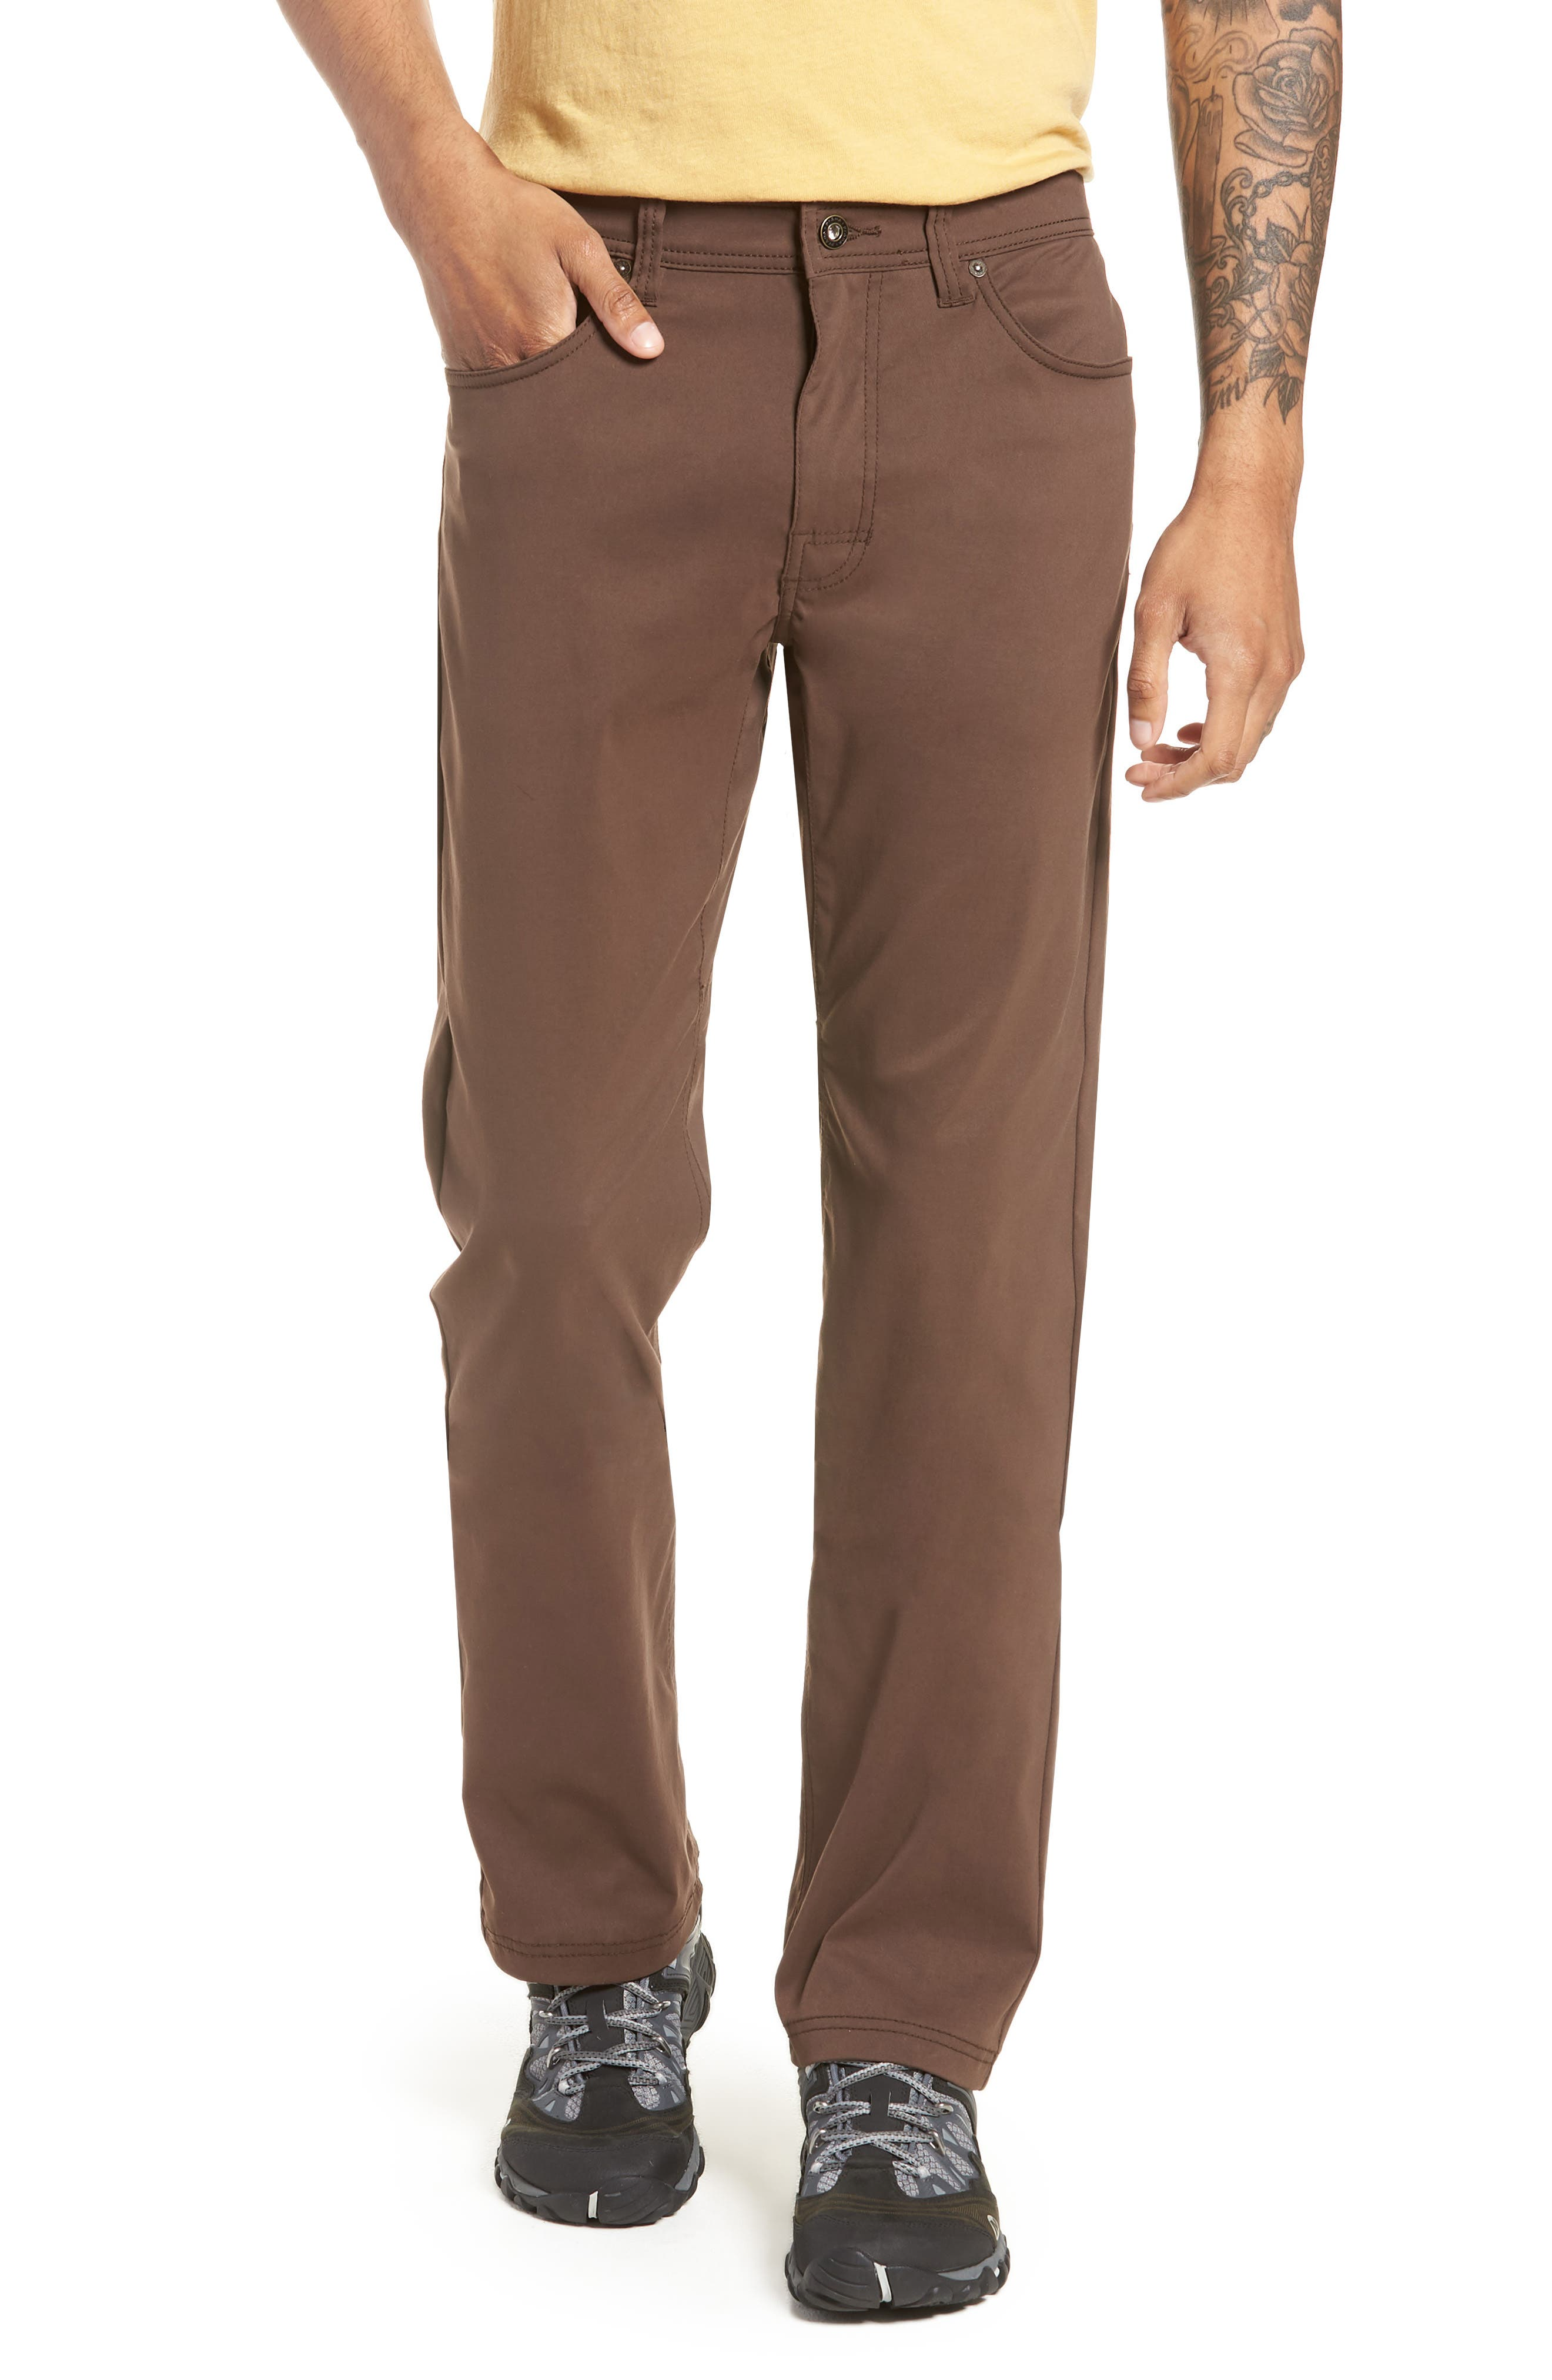 Men's Prana Brion Slim Fit Pants, Size 36 - Brown